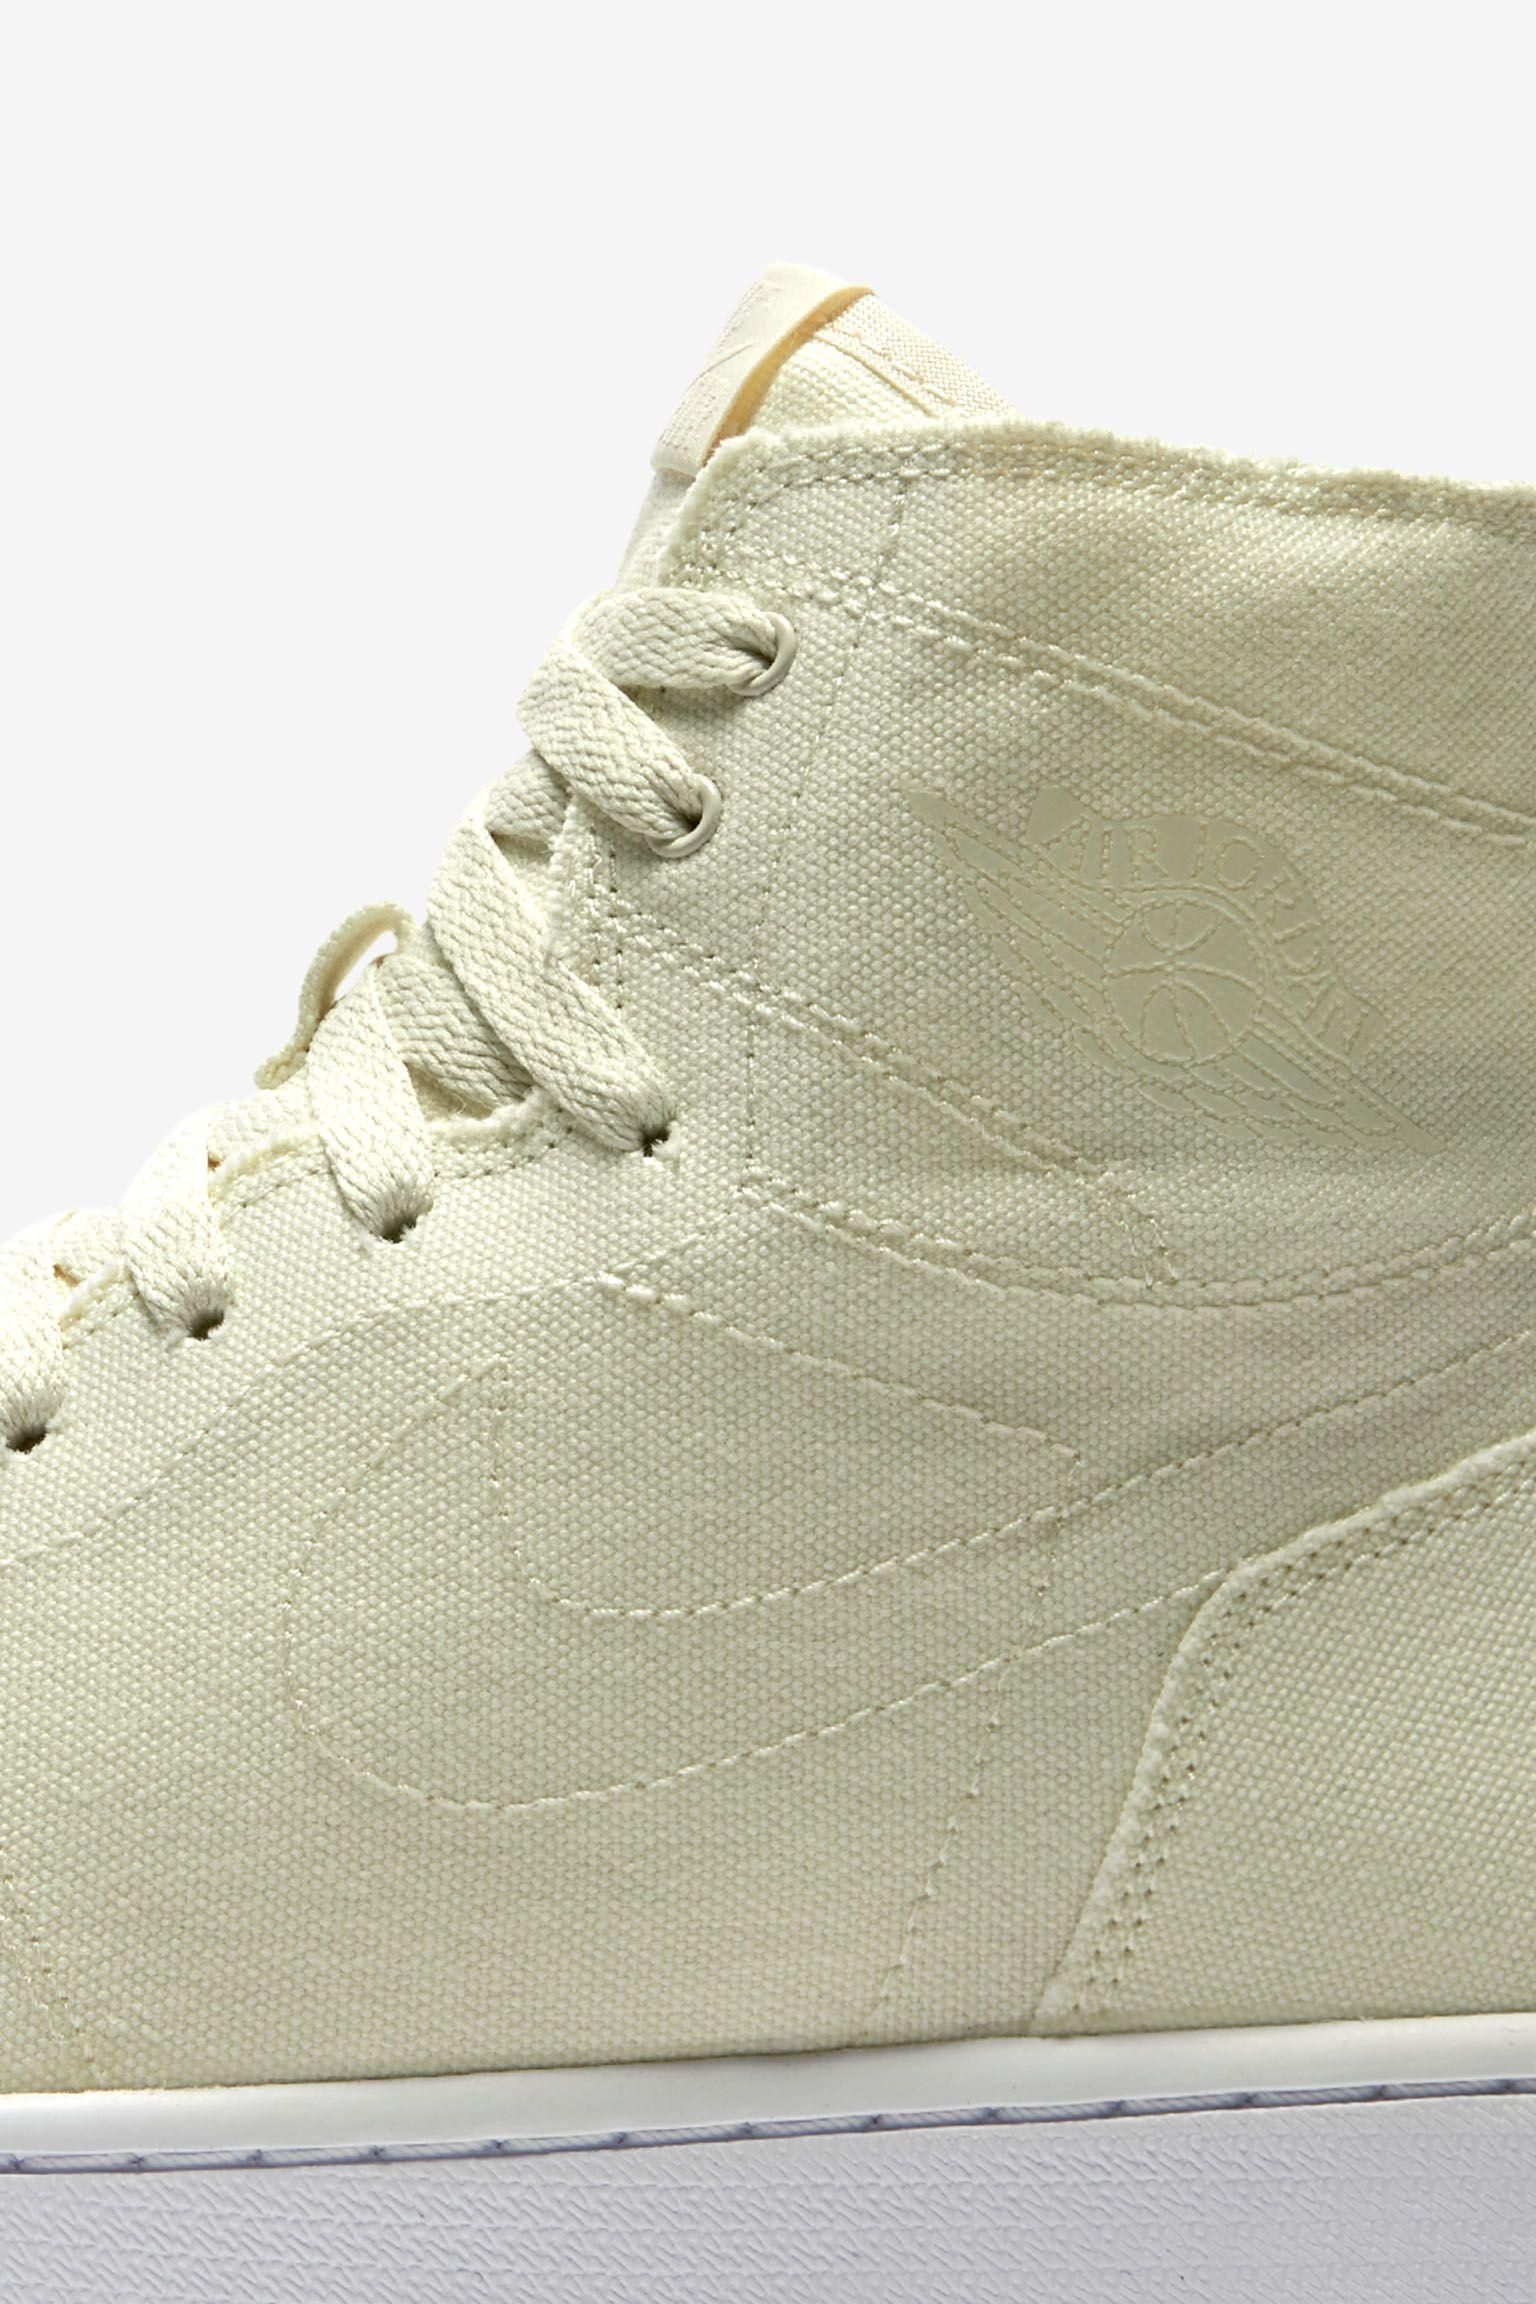 Air Jordan 1 Retro 'Deconstructed Ivory' Release Date